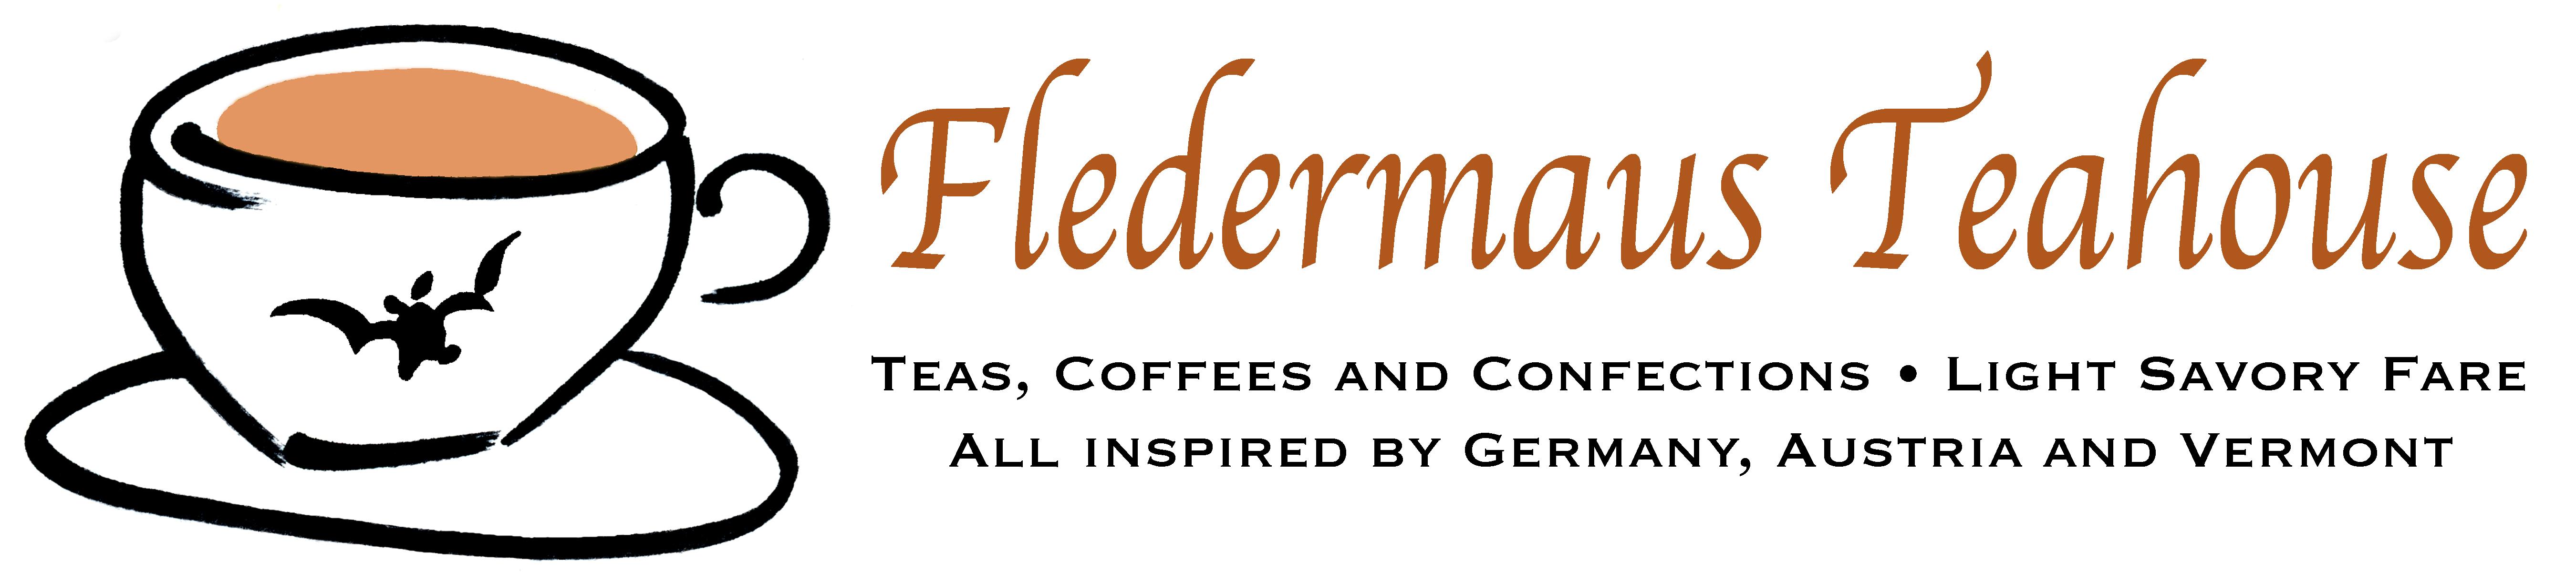 Fledermaus Teahouse